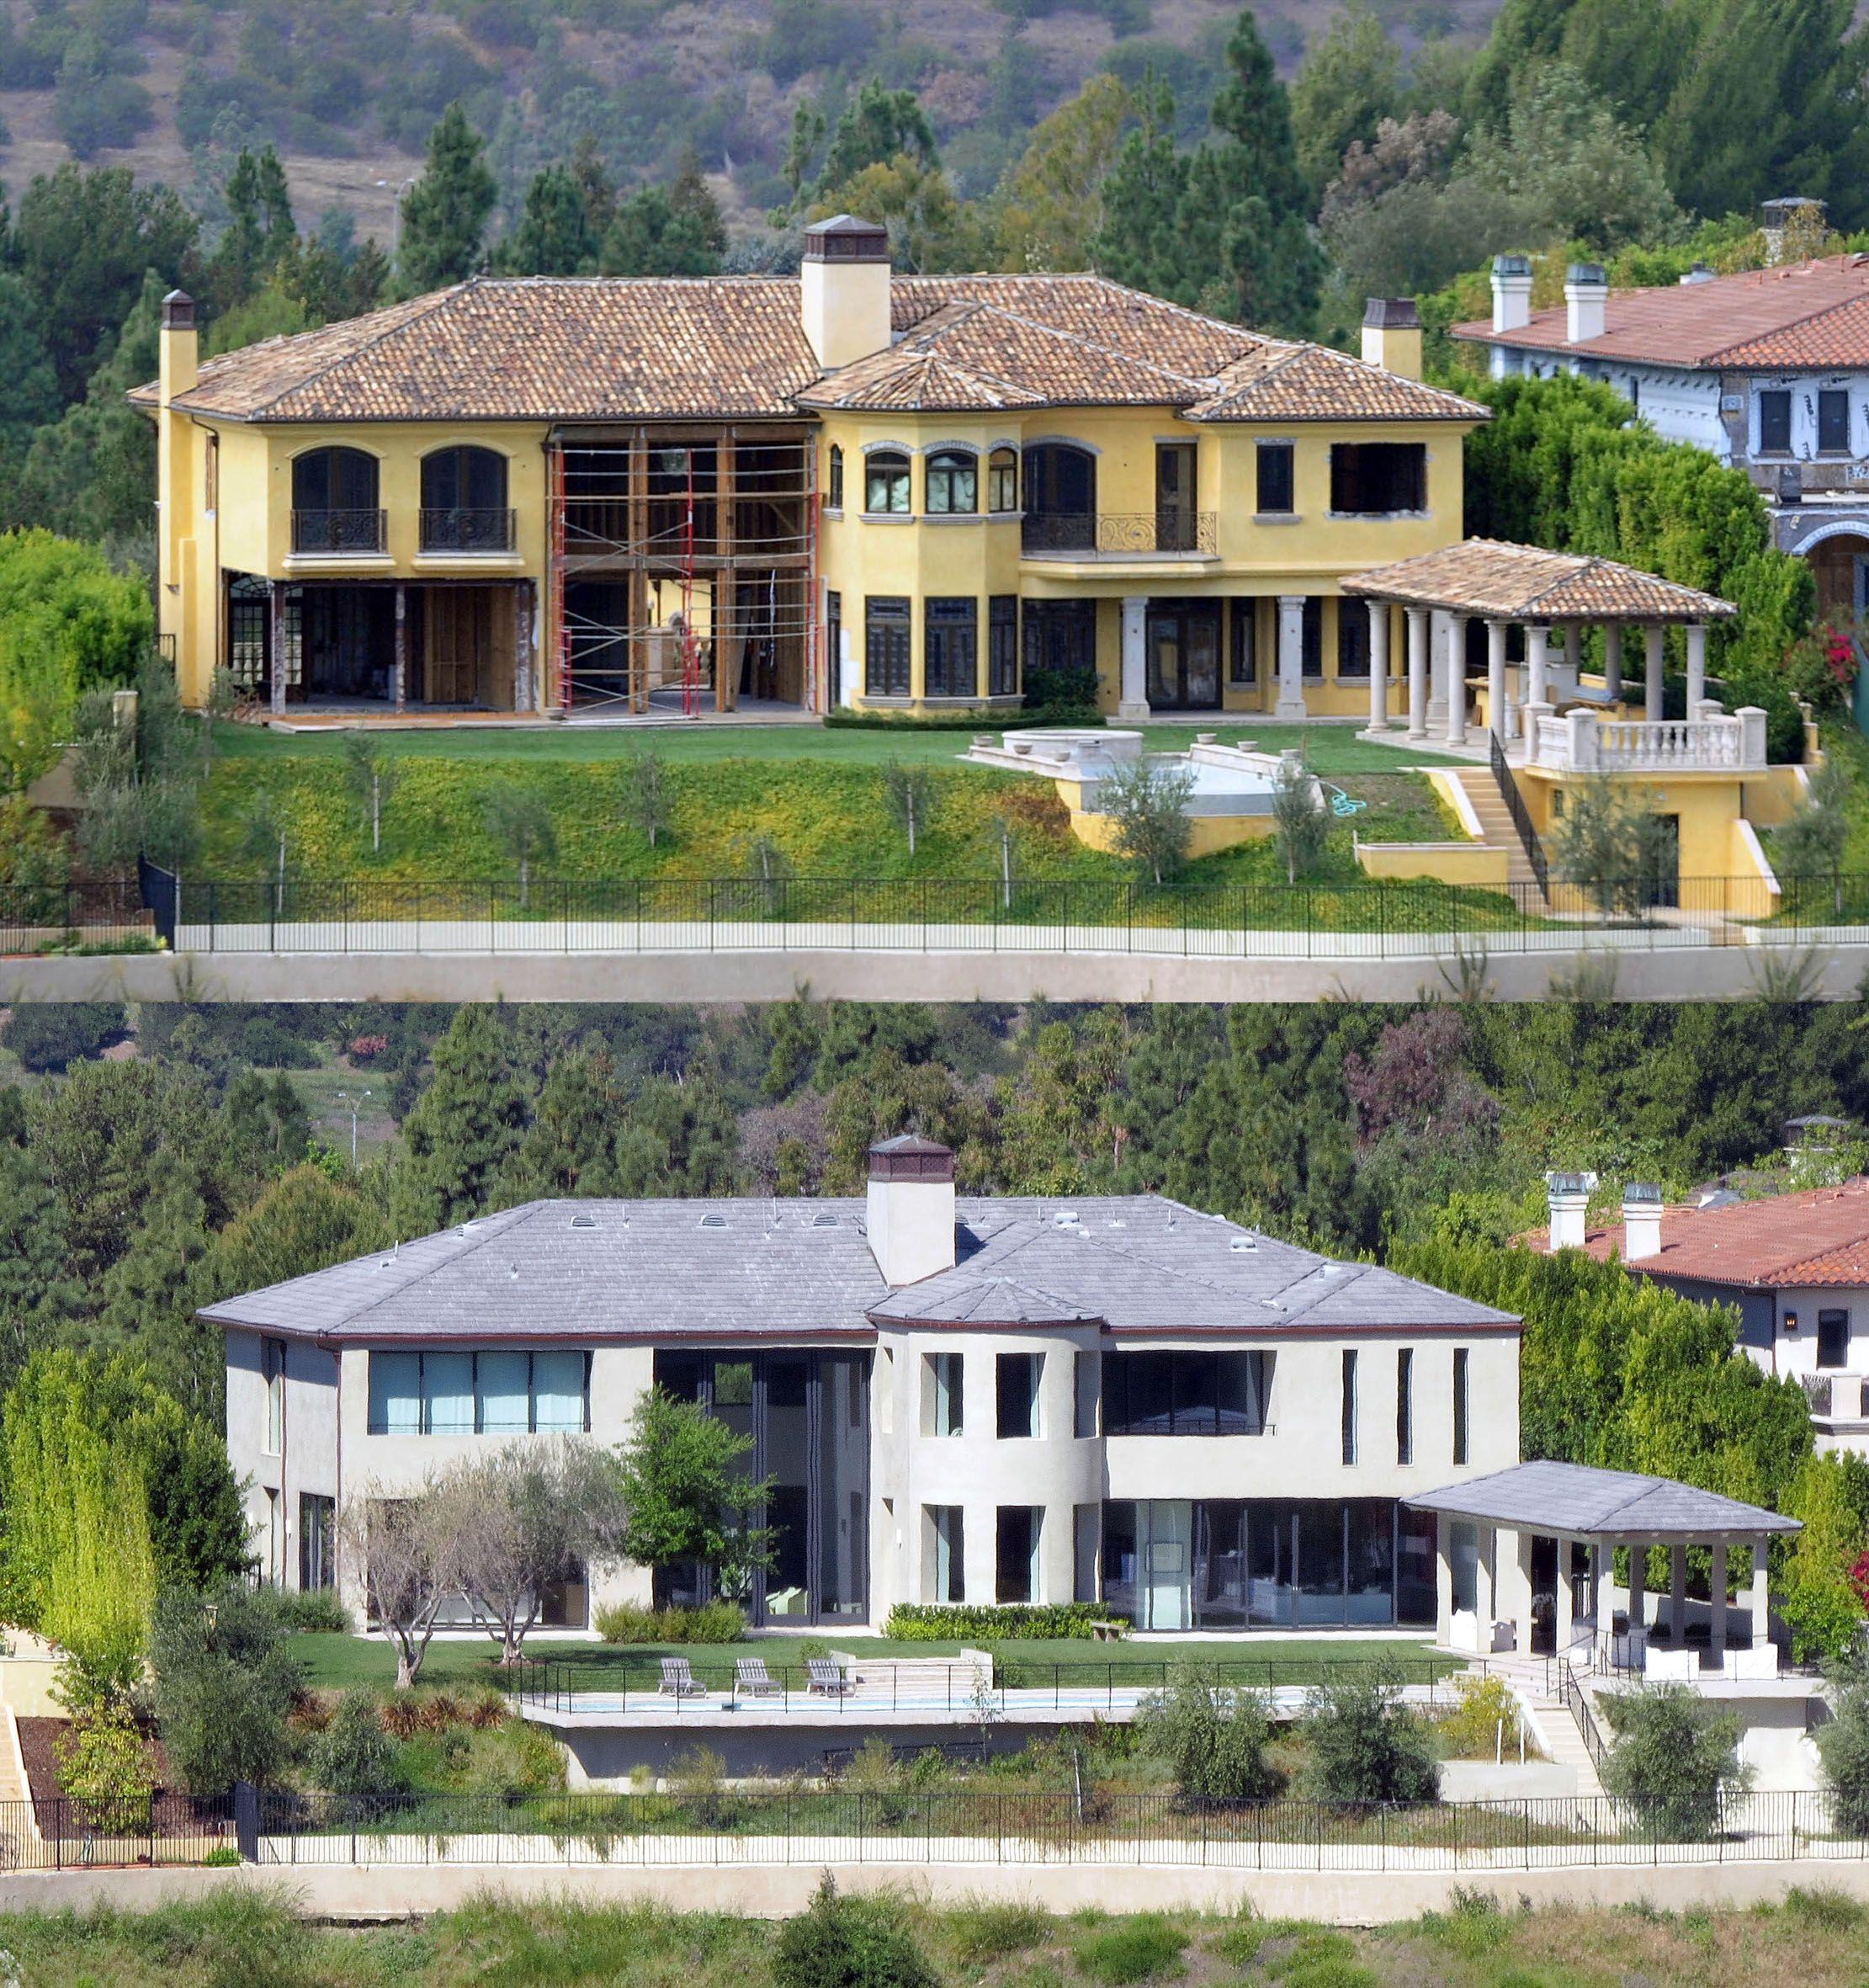 Video Kim Kardashian Kanye West Flipped This House To Sell To